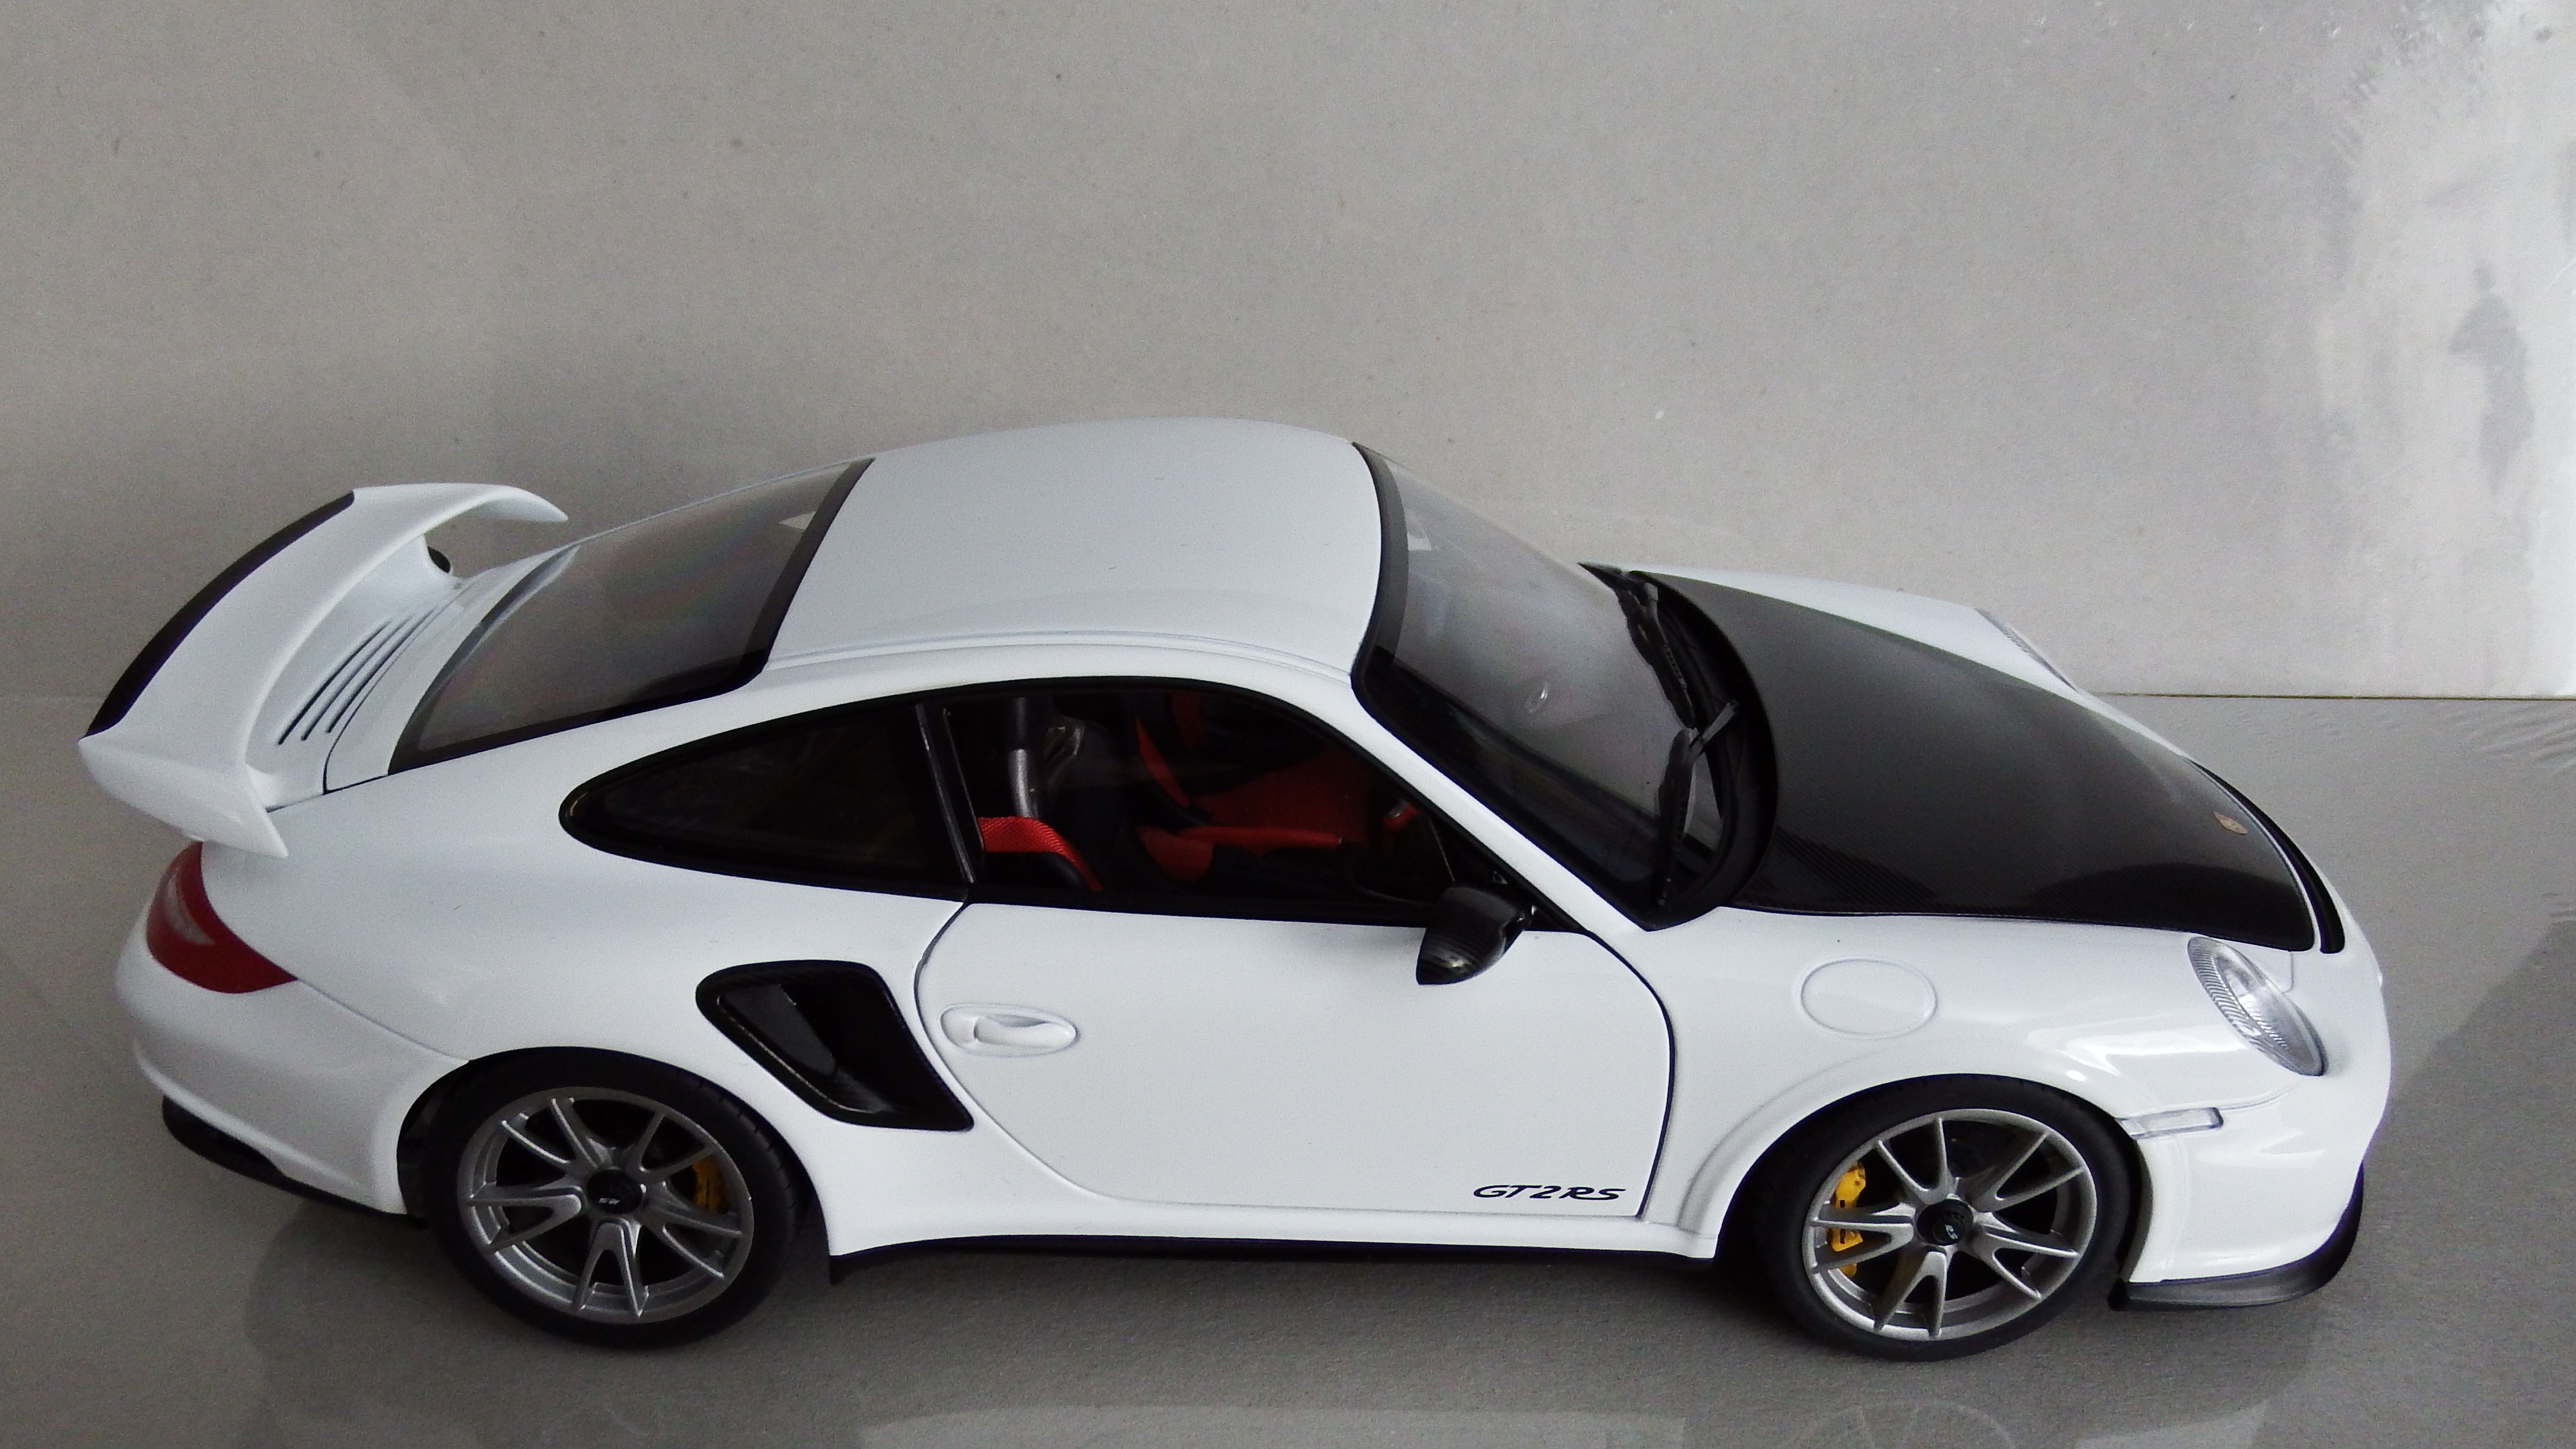 CD8RpJ Outstanding Porsche 911 Gt2 Hot Wheels Cars Trend